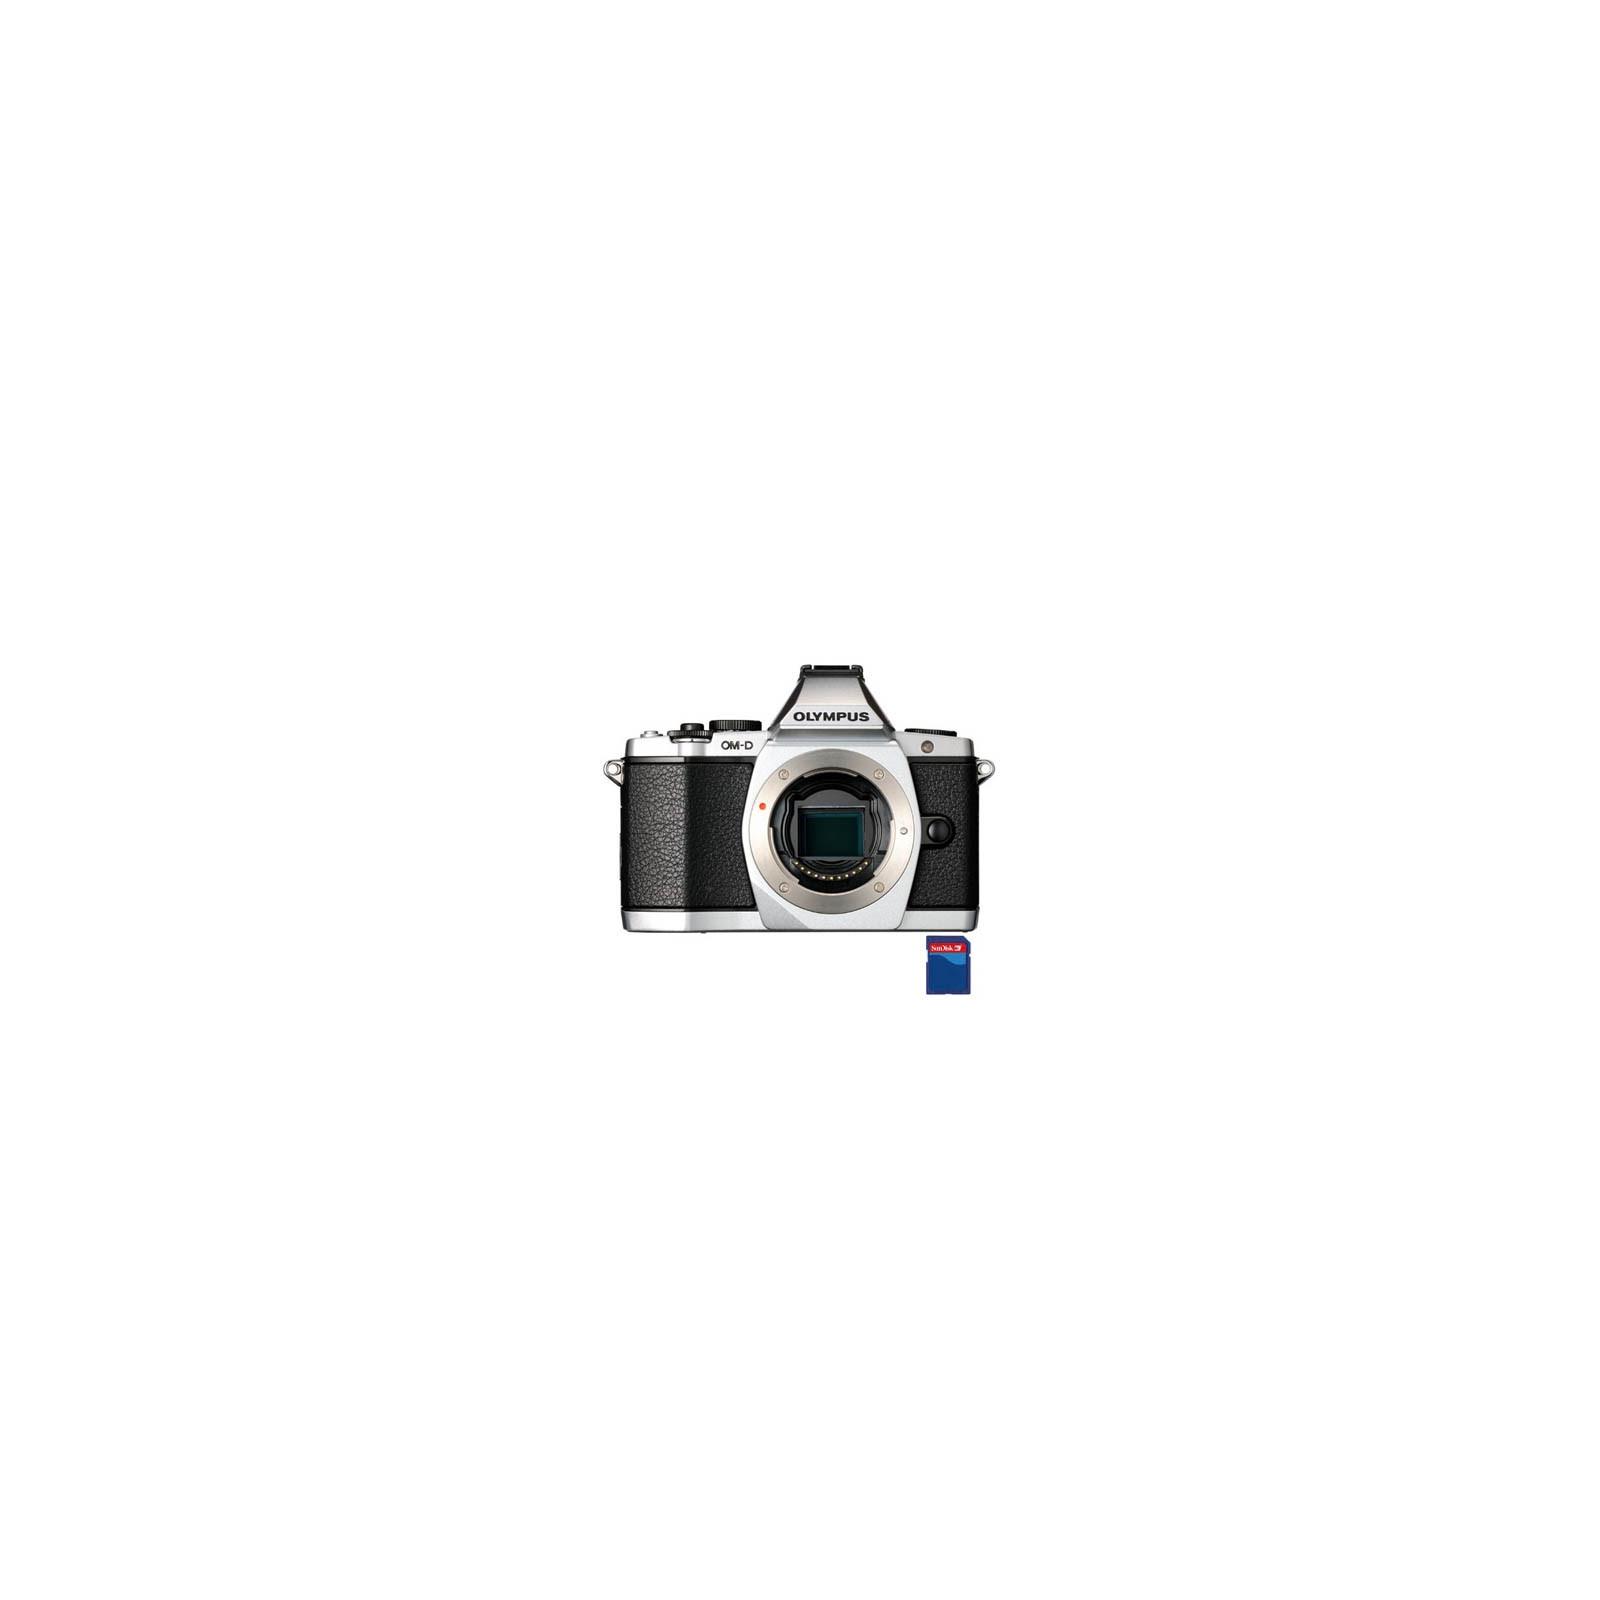 Цифровой фотоаппарат OLYMPUS OM-D E-M5 body silver (V204040SE000)